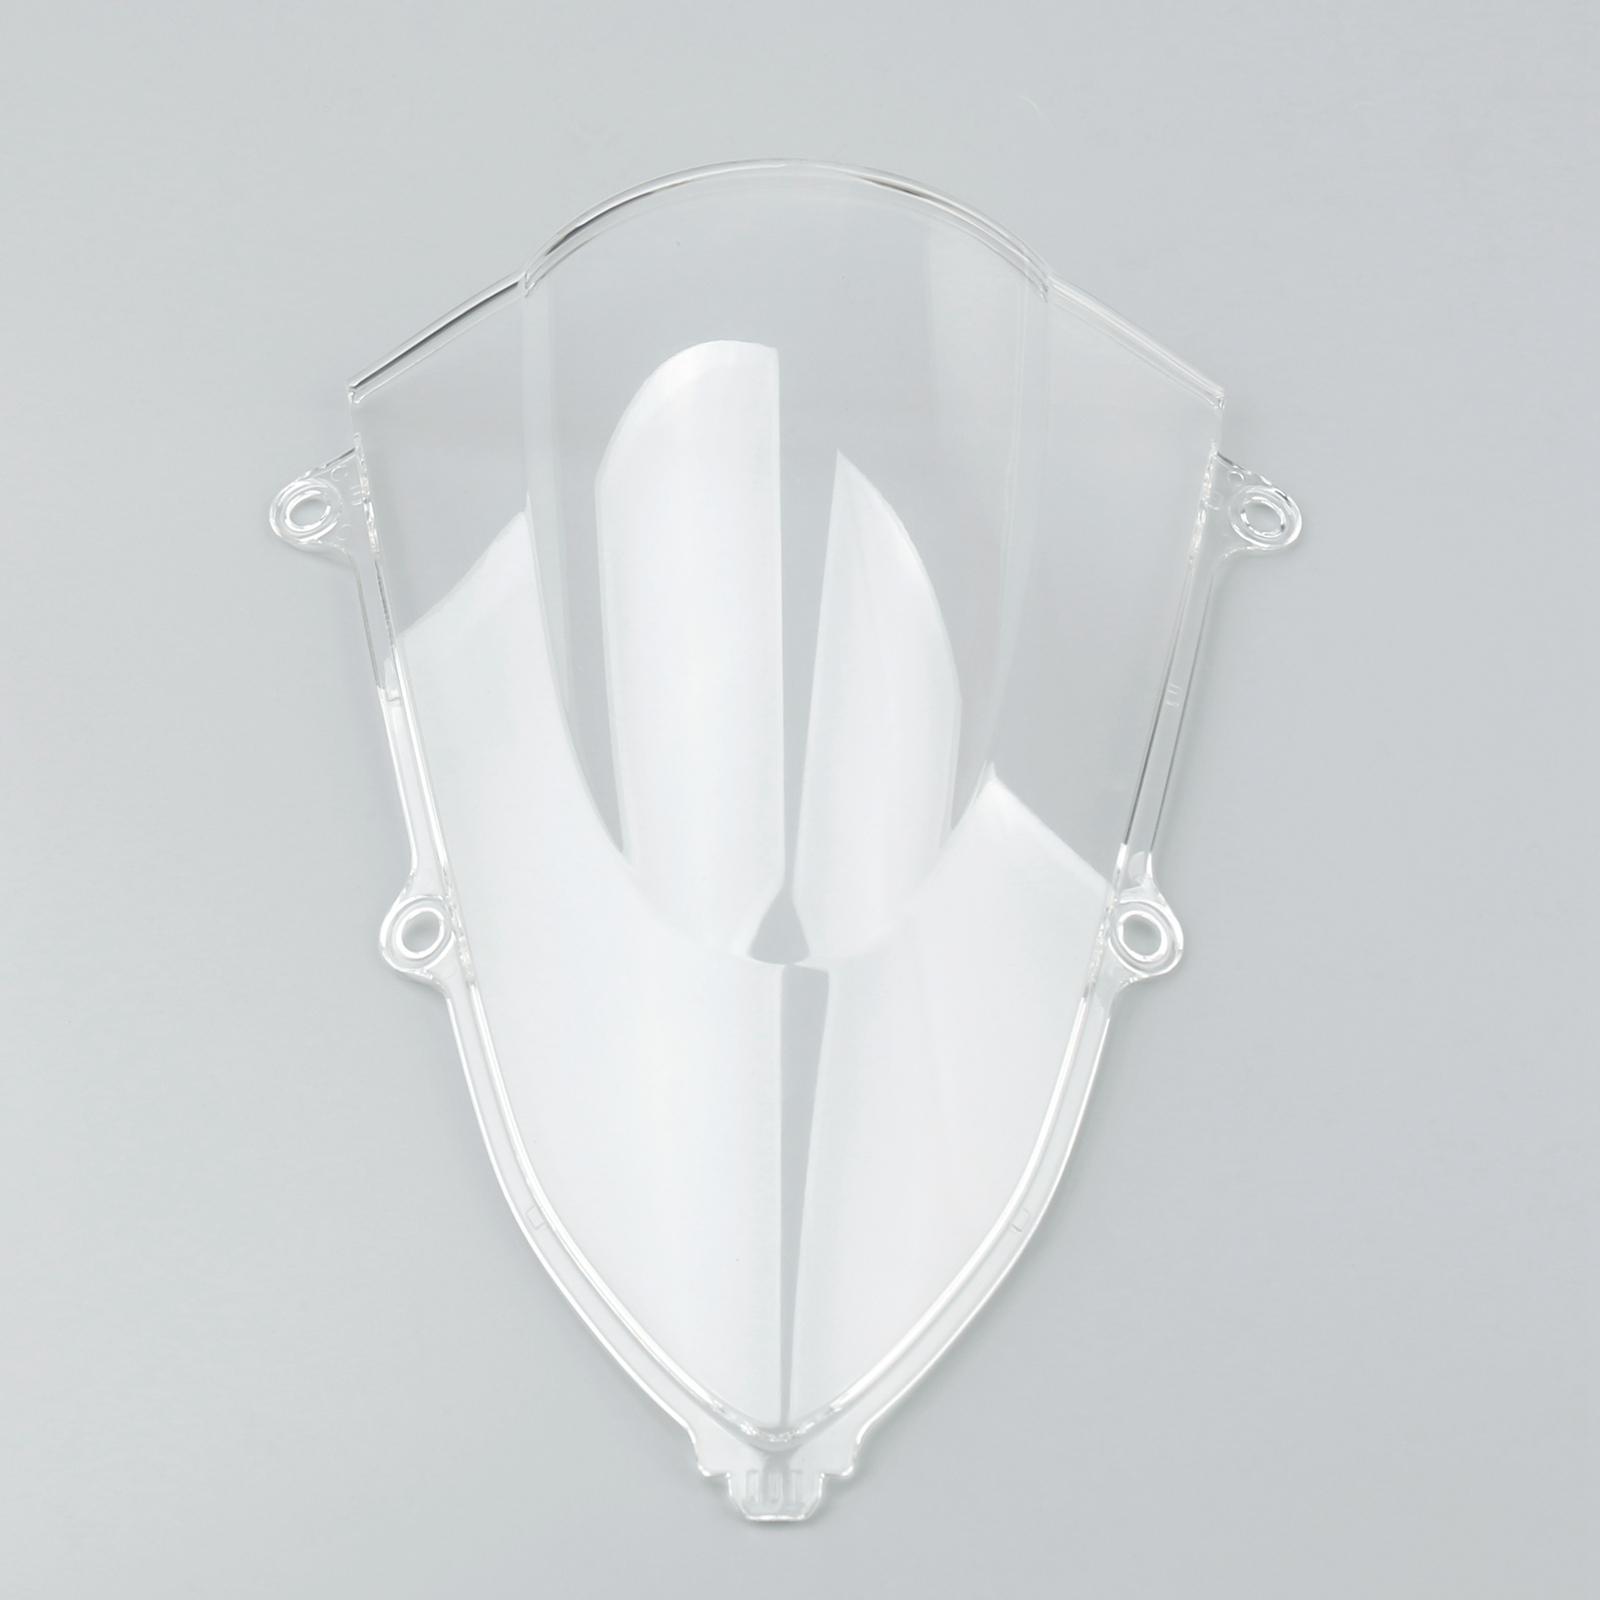 areyourshop-windshield-windscreen-double-bubble-for-honda-cbr600rr2007-2008-smoke-8877-67582783-7a4dcf607a4551329677c54d1d739e07-catalog_233 Harga Daftar Harga Cicilan Honda Cbr 250 Termurah Maret 2019